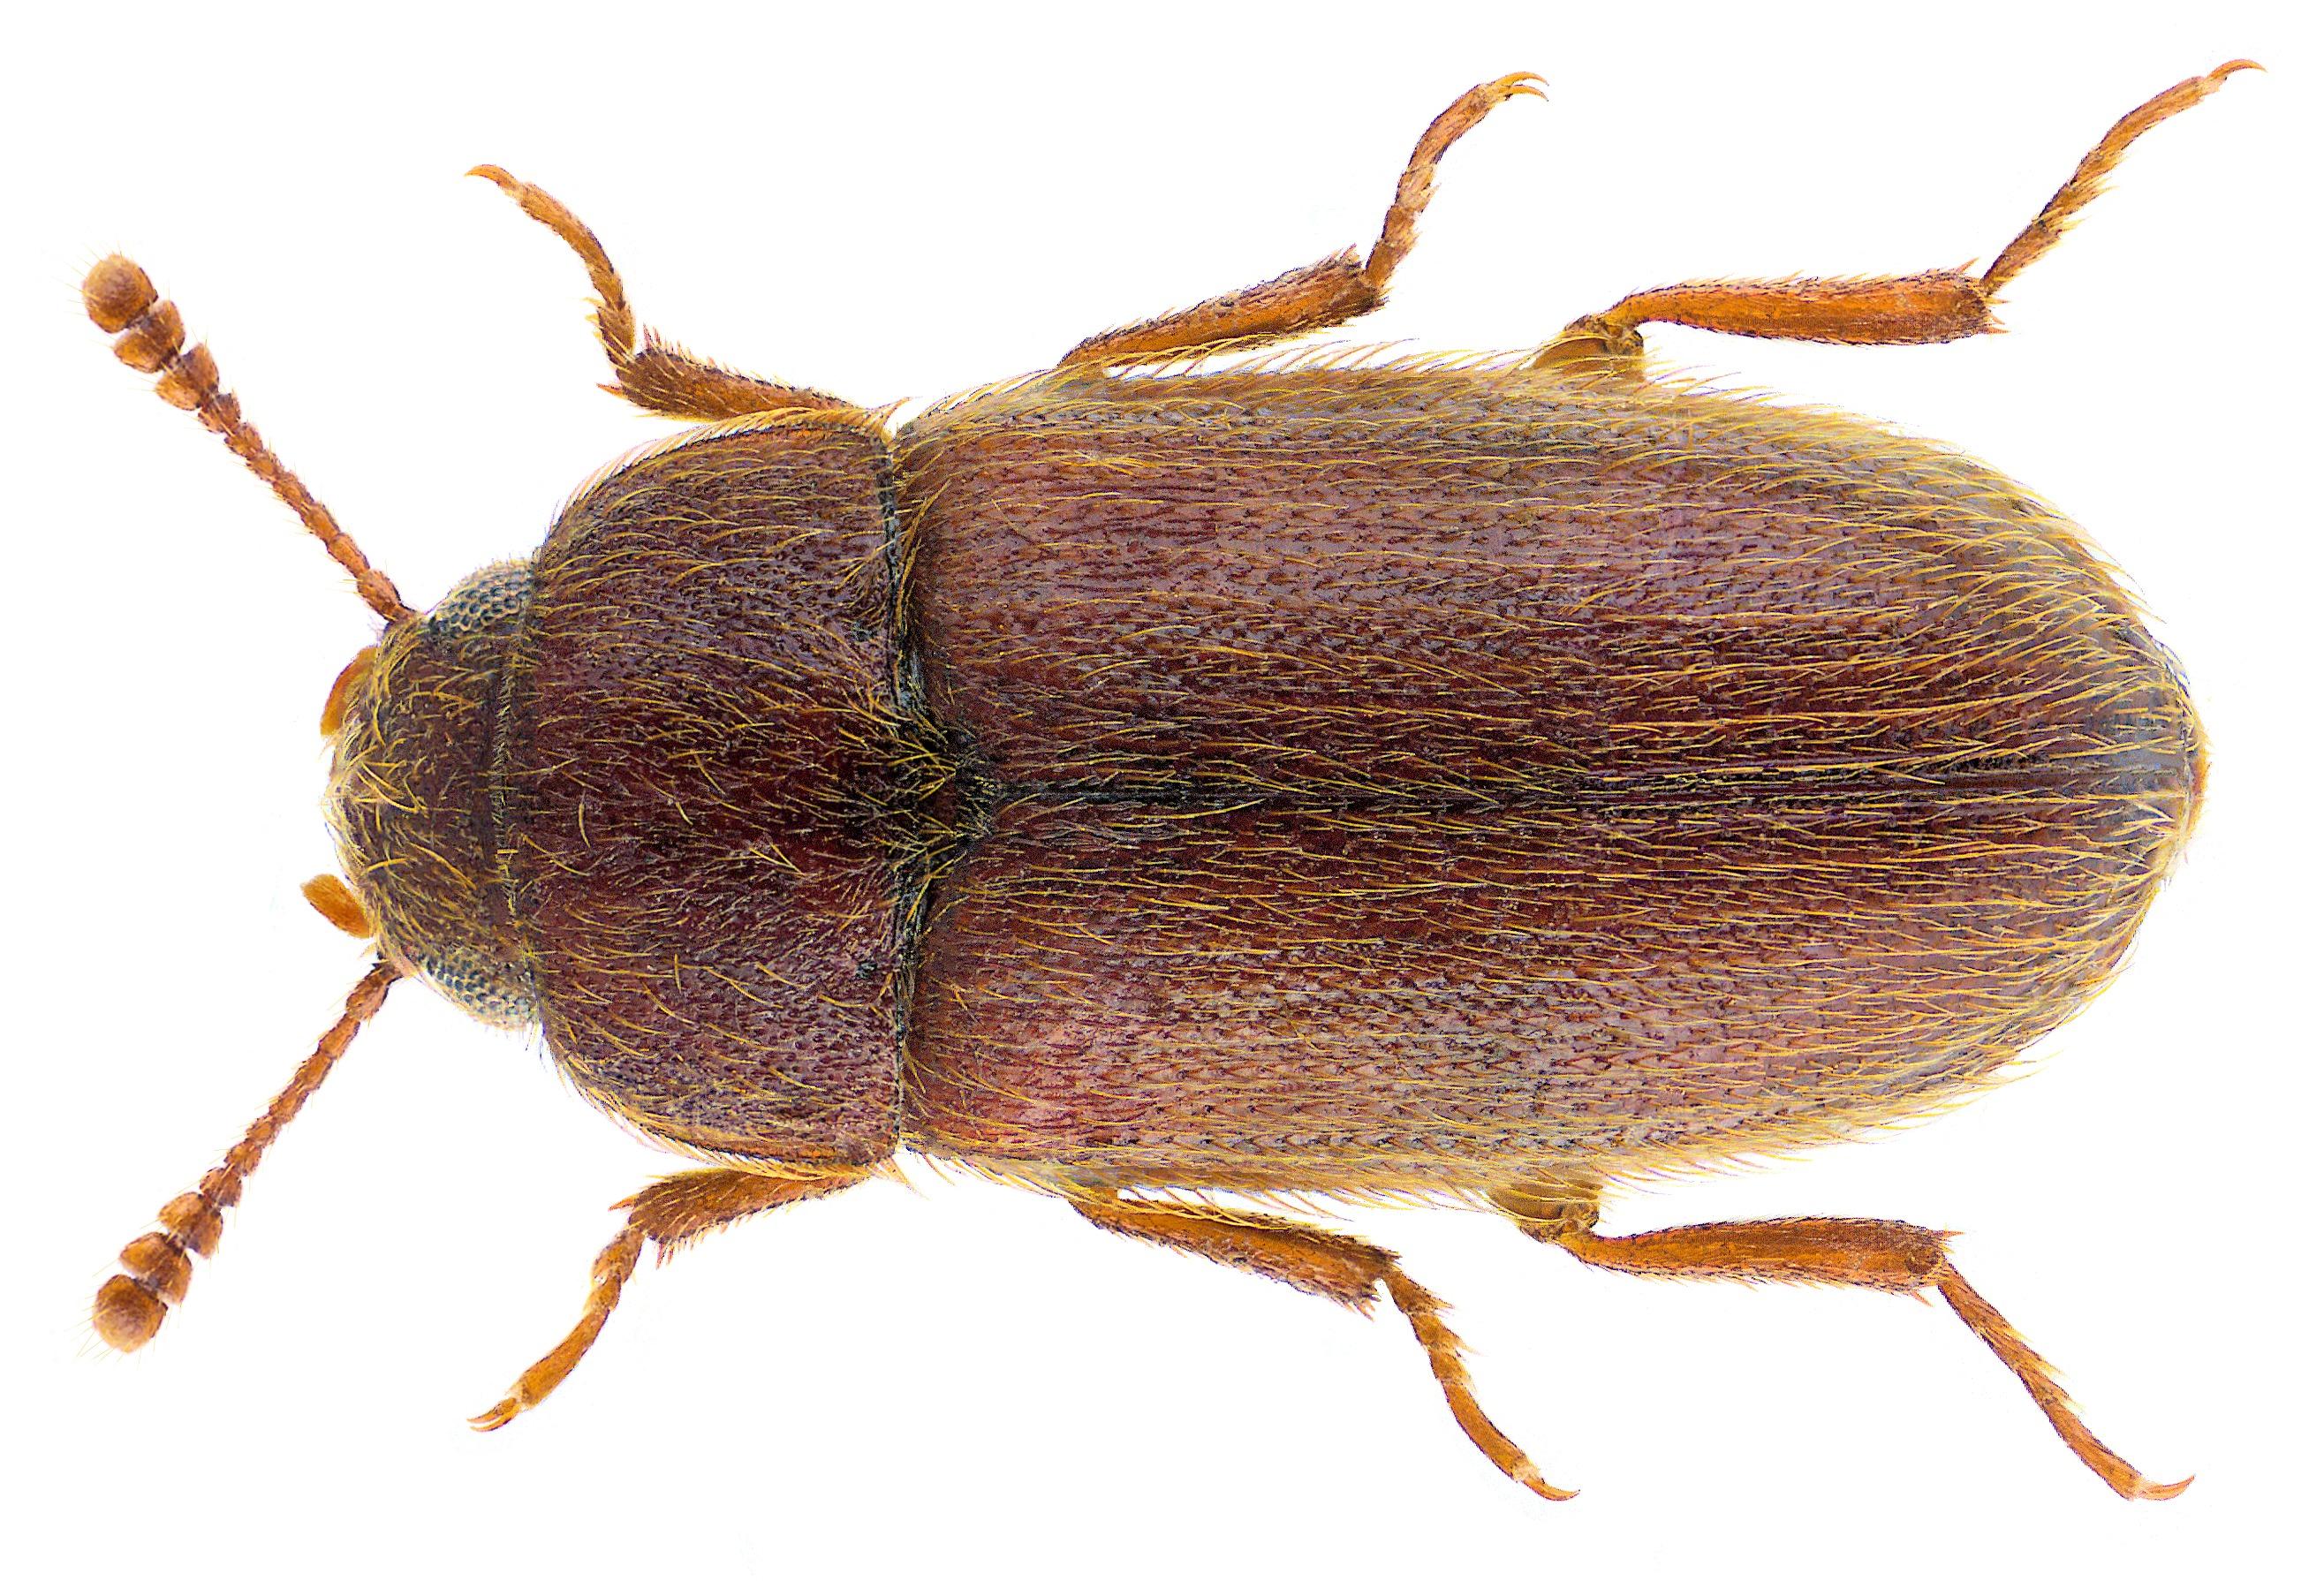 Image of Hairy Fungus Beetle